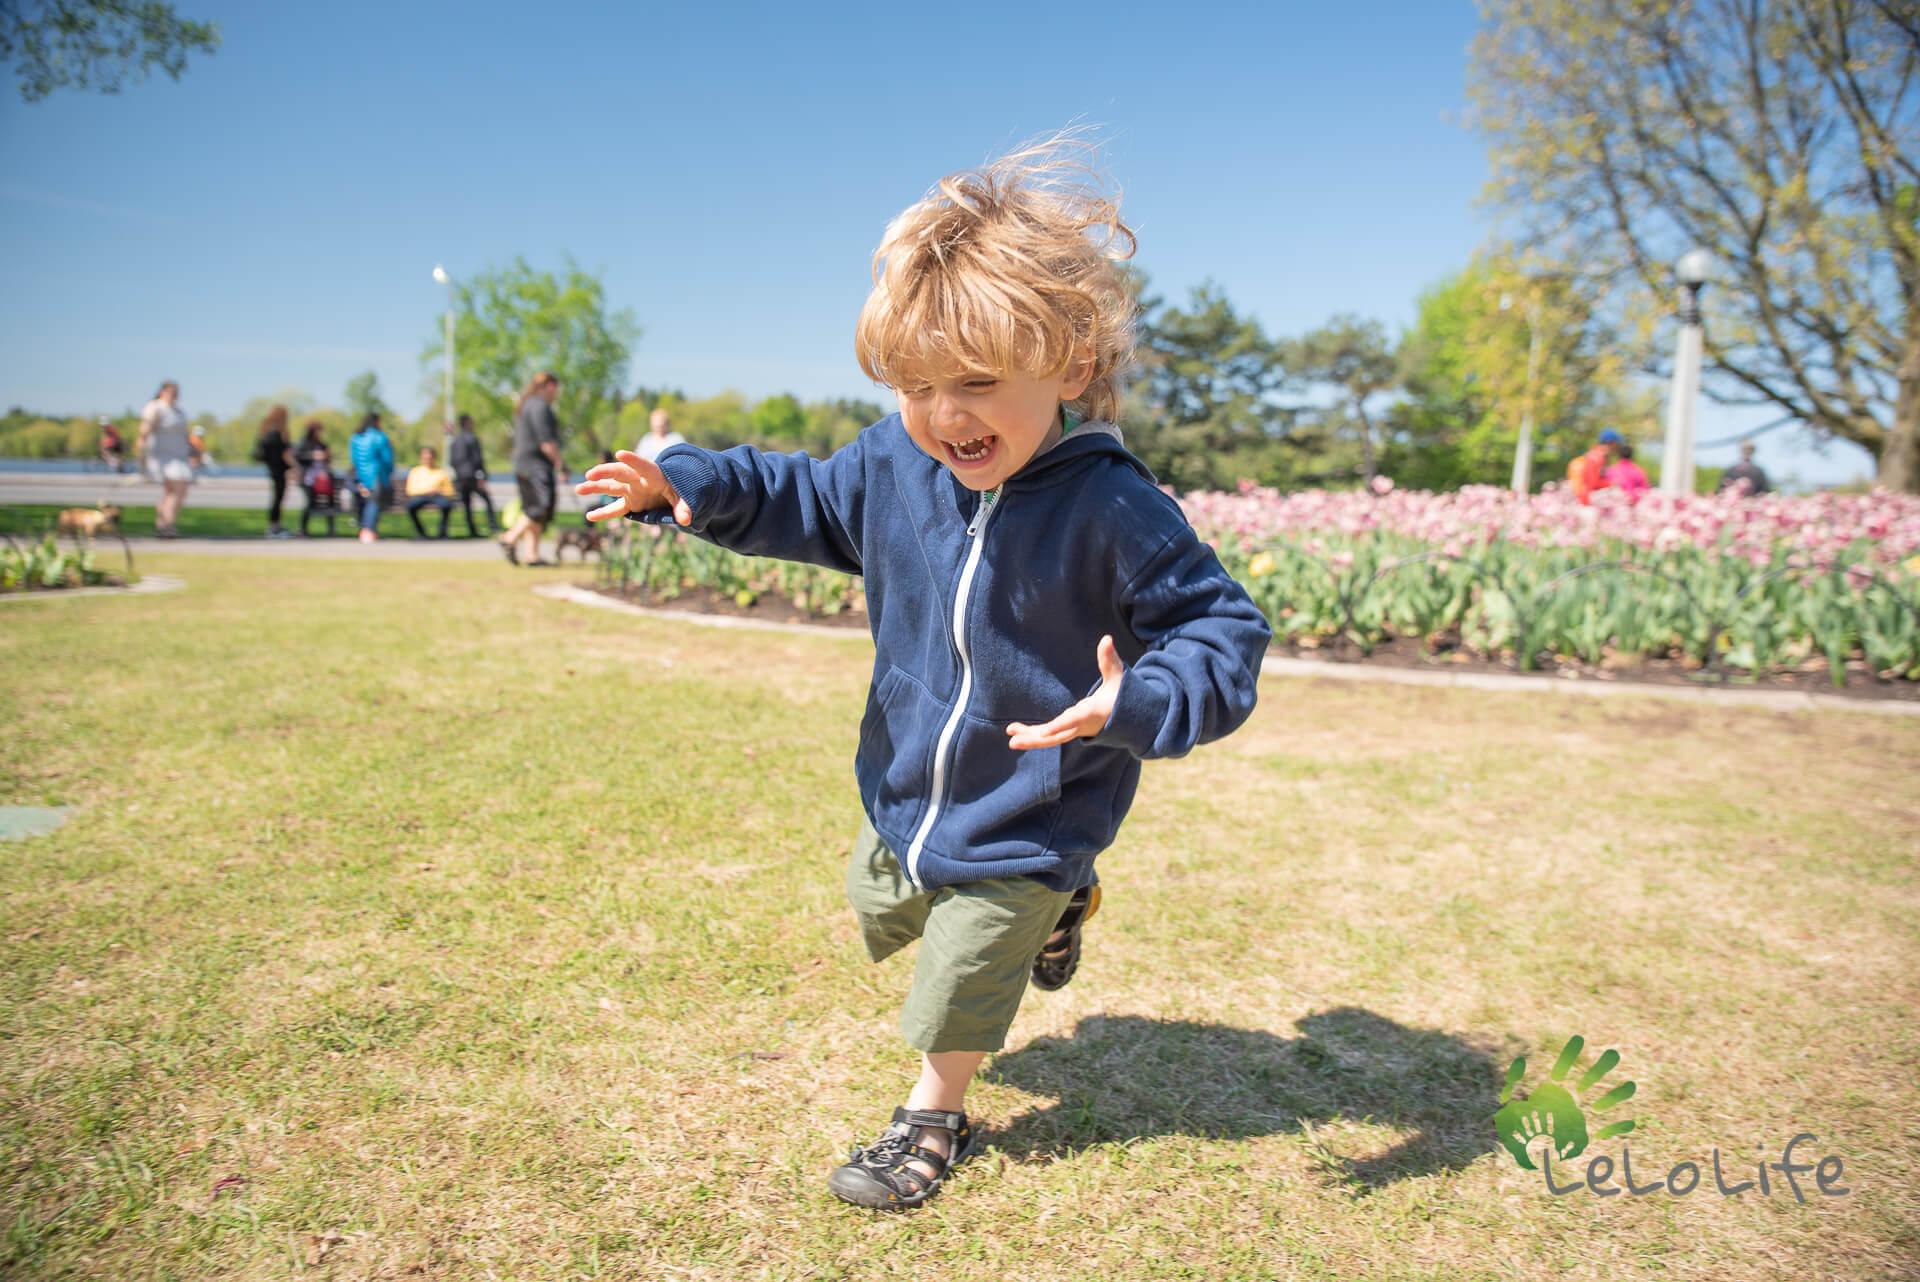 LeLoLife - Marcher avec les enfants - Festival de tulipes d'Ottawa